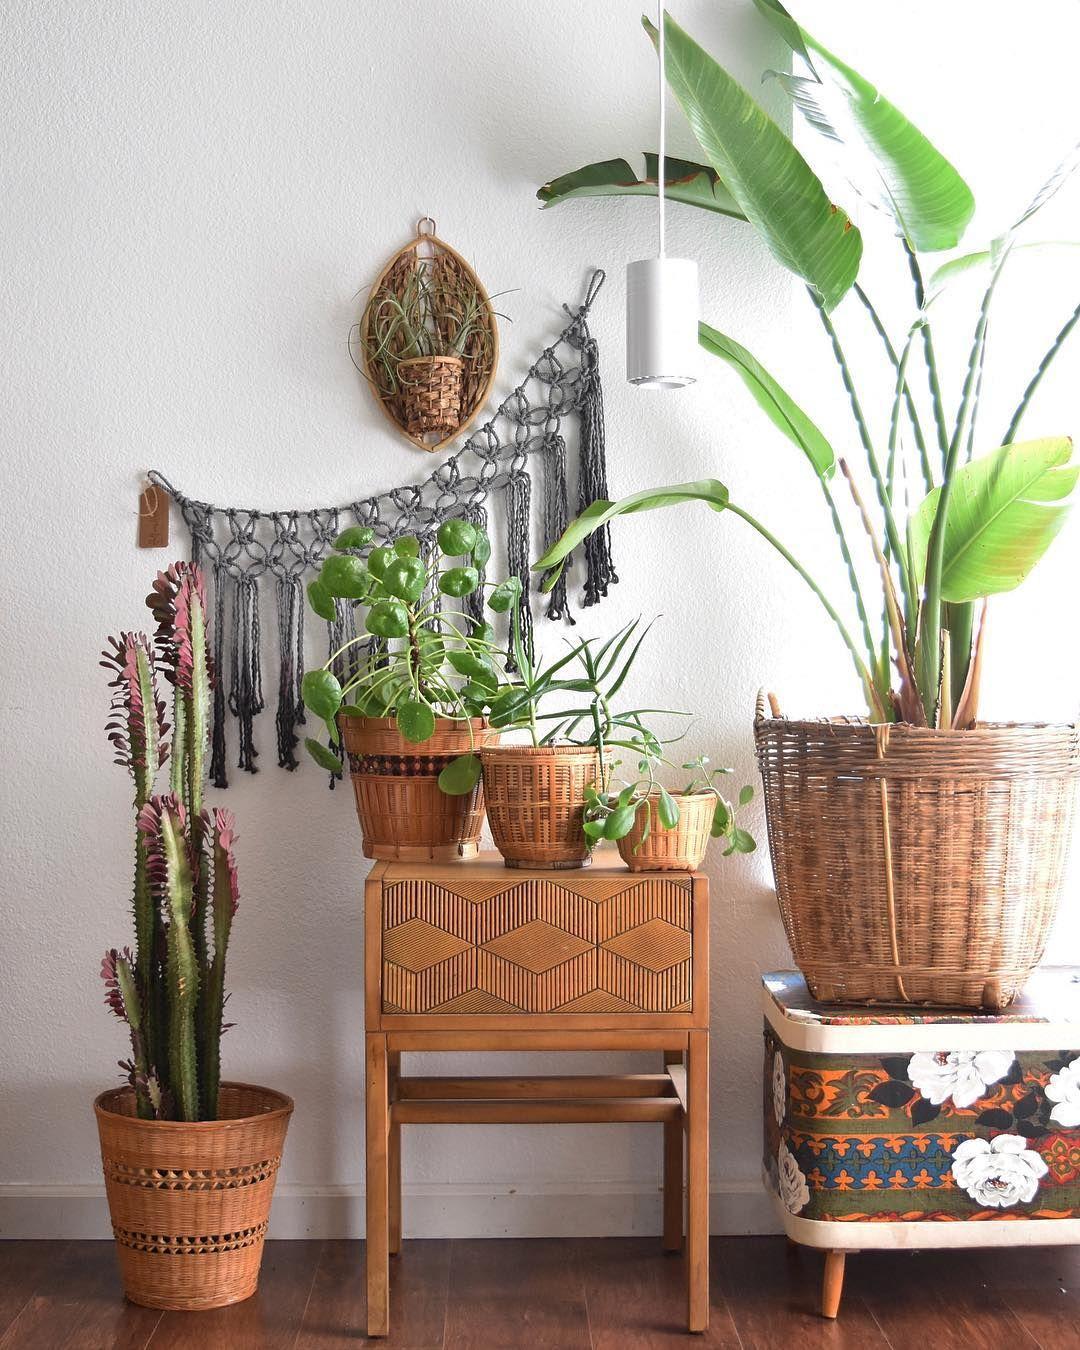 Pilea Peperomioides Houseplants Indoor Plants Plants Decor Home Decor Interior Style Plant Corner Nordic Style Scandin Plant Decor Big Indoor Plants Big Plants #plants #for #living #room #corner